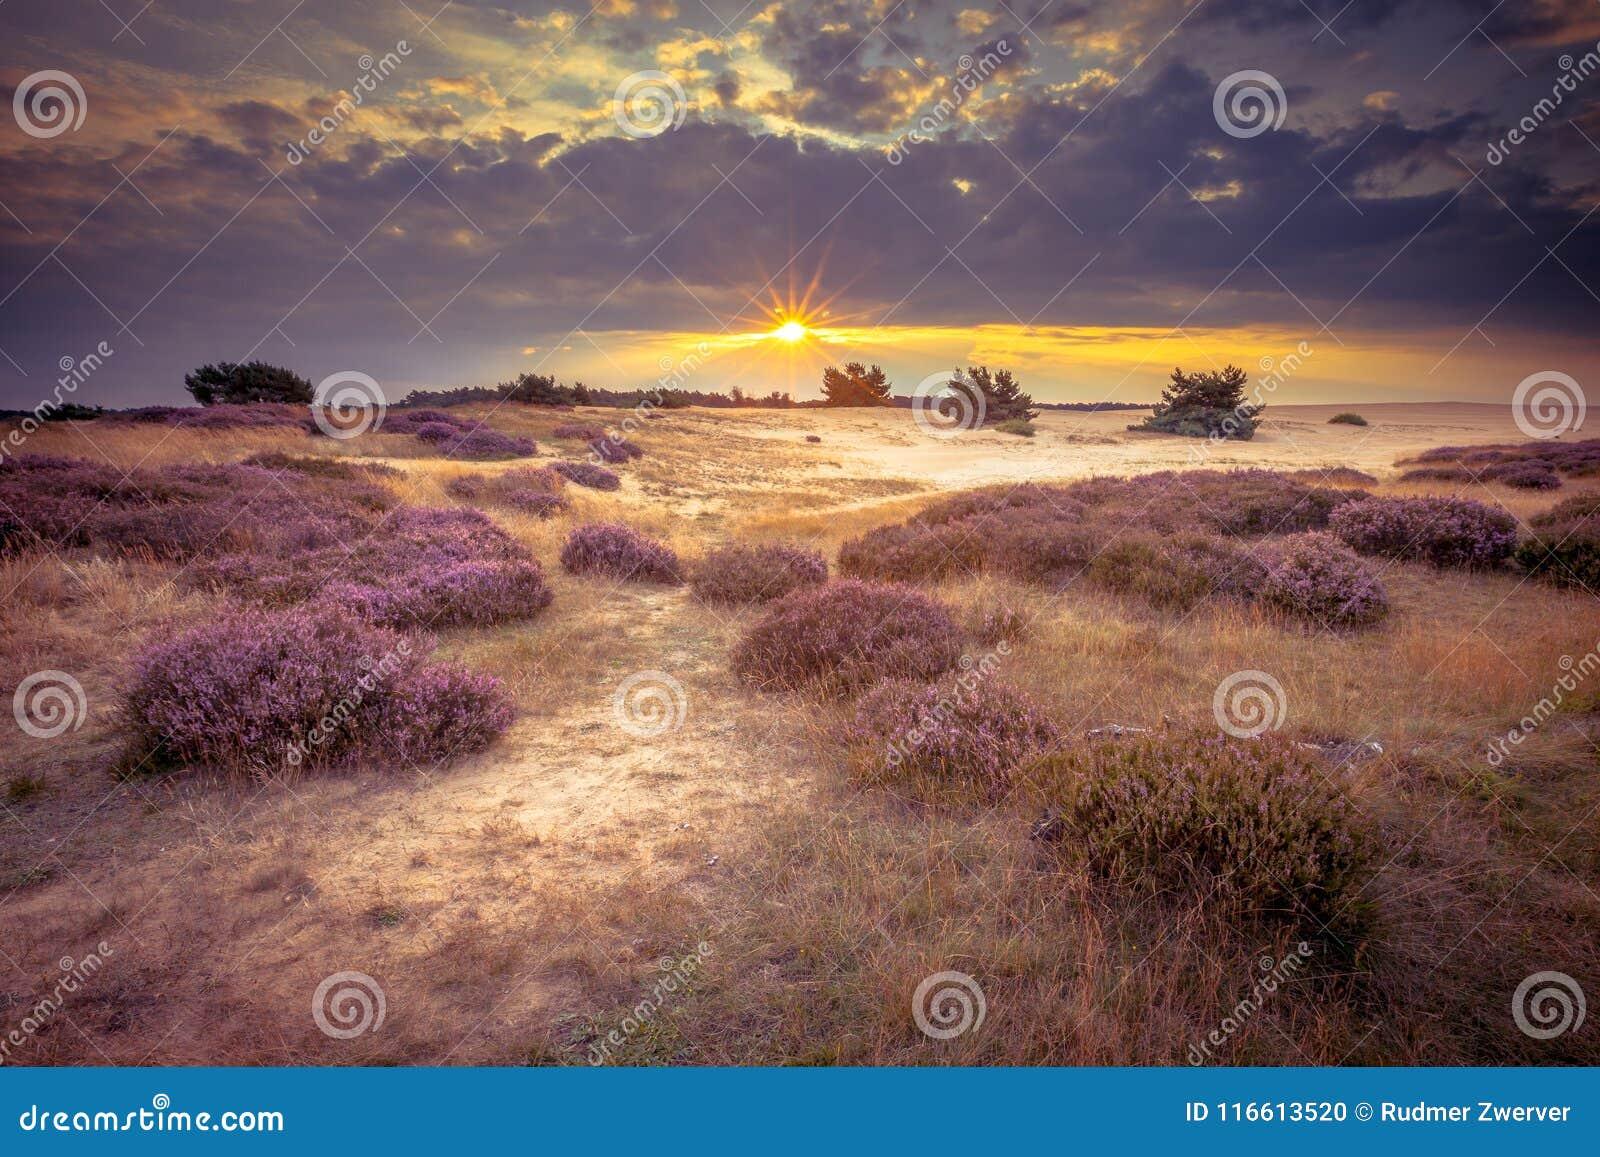 Hoge Veluwe在减速火箭的颜色的沙子欧石南丛生的荒野